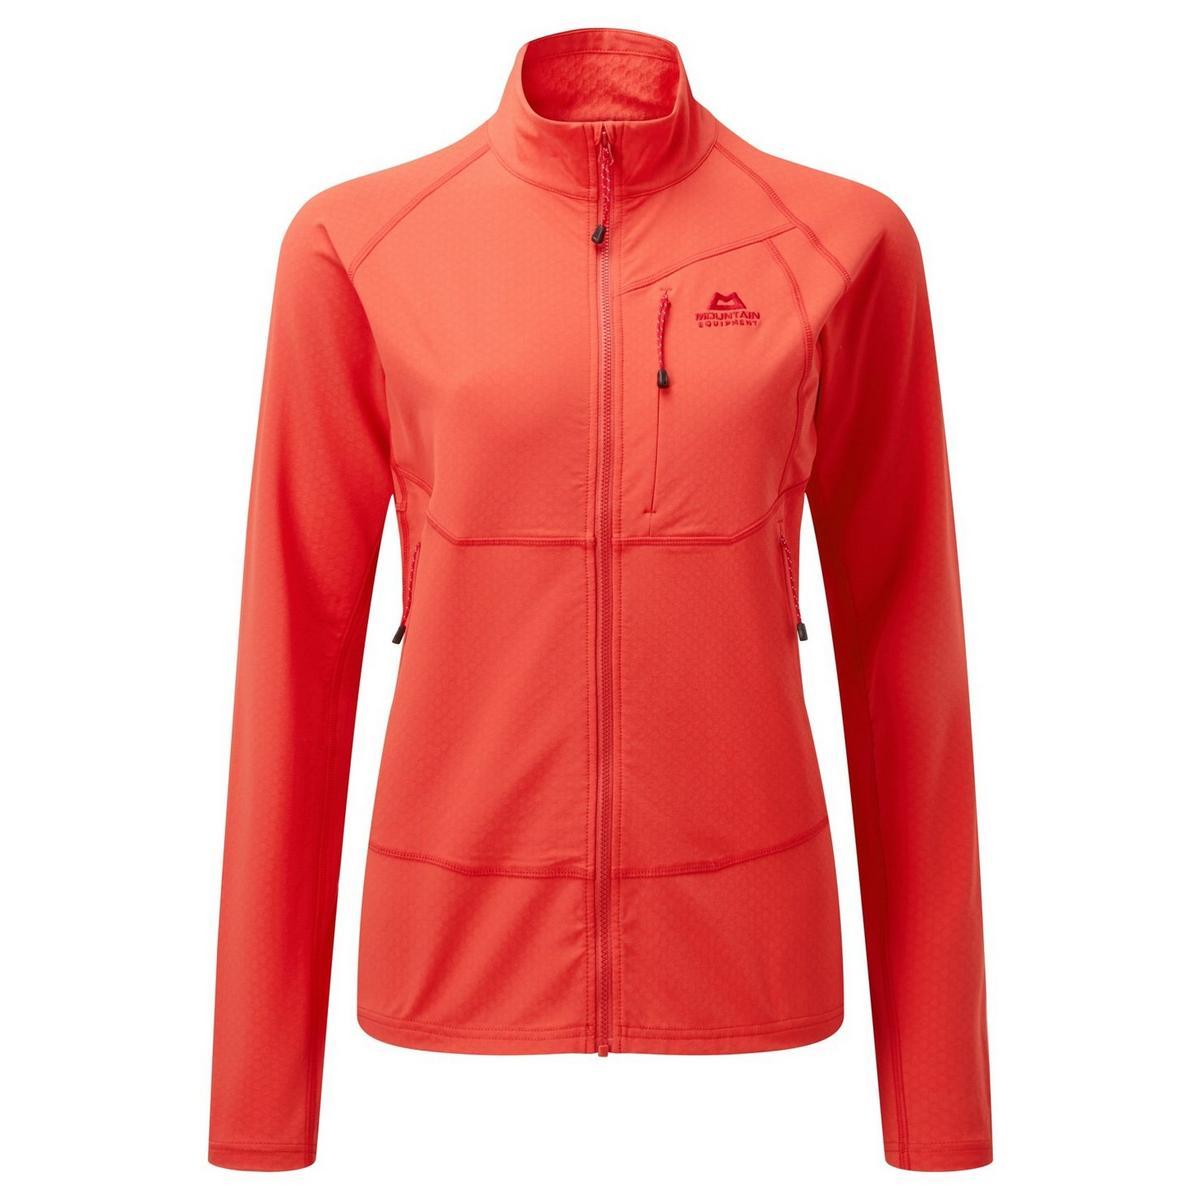 Mountain Equipment Women's Arrow Jacket - Pop Red